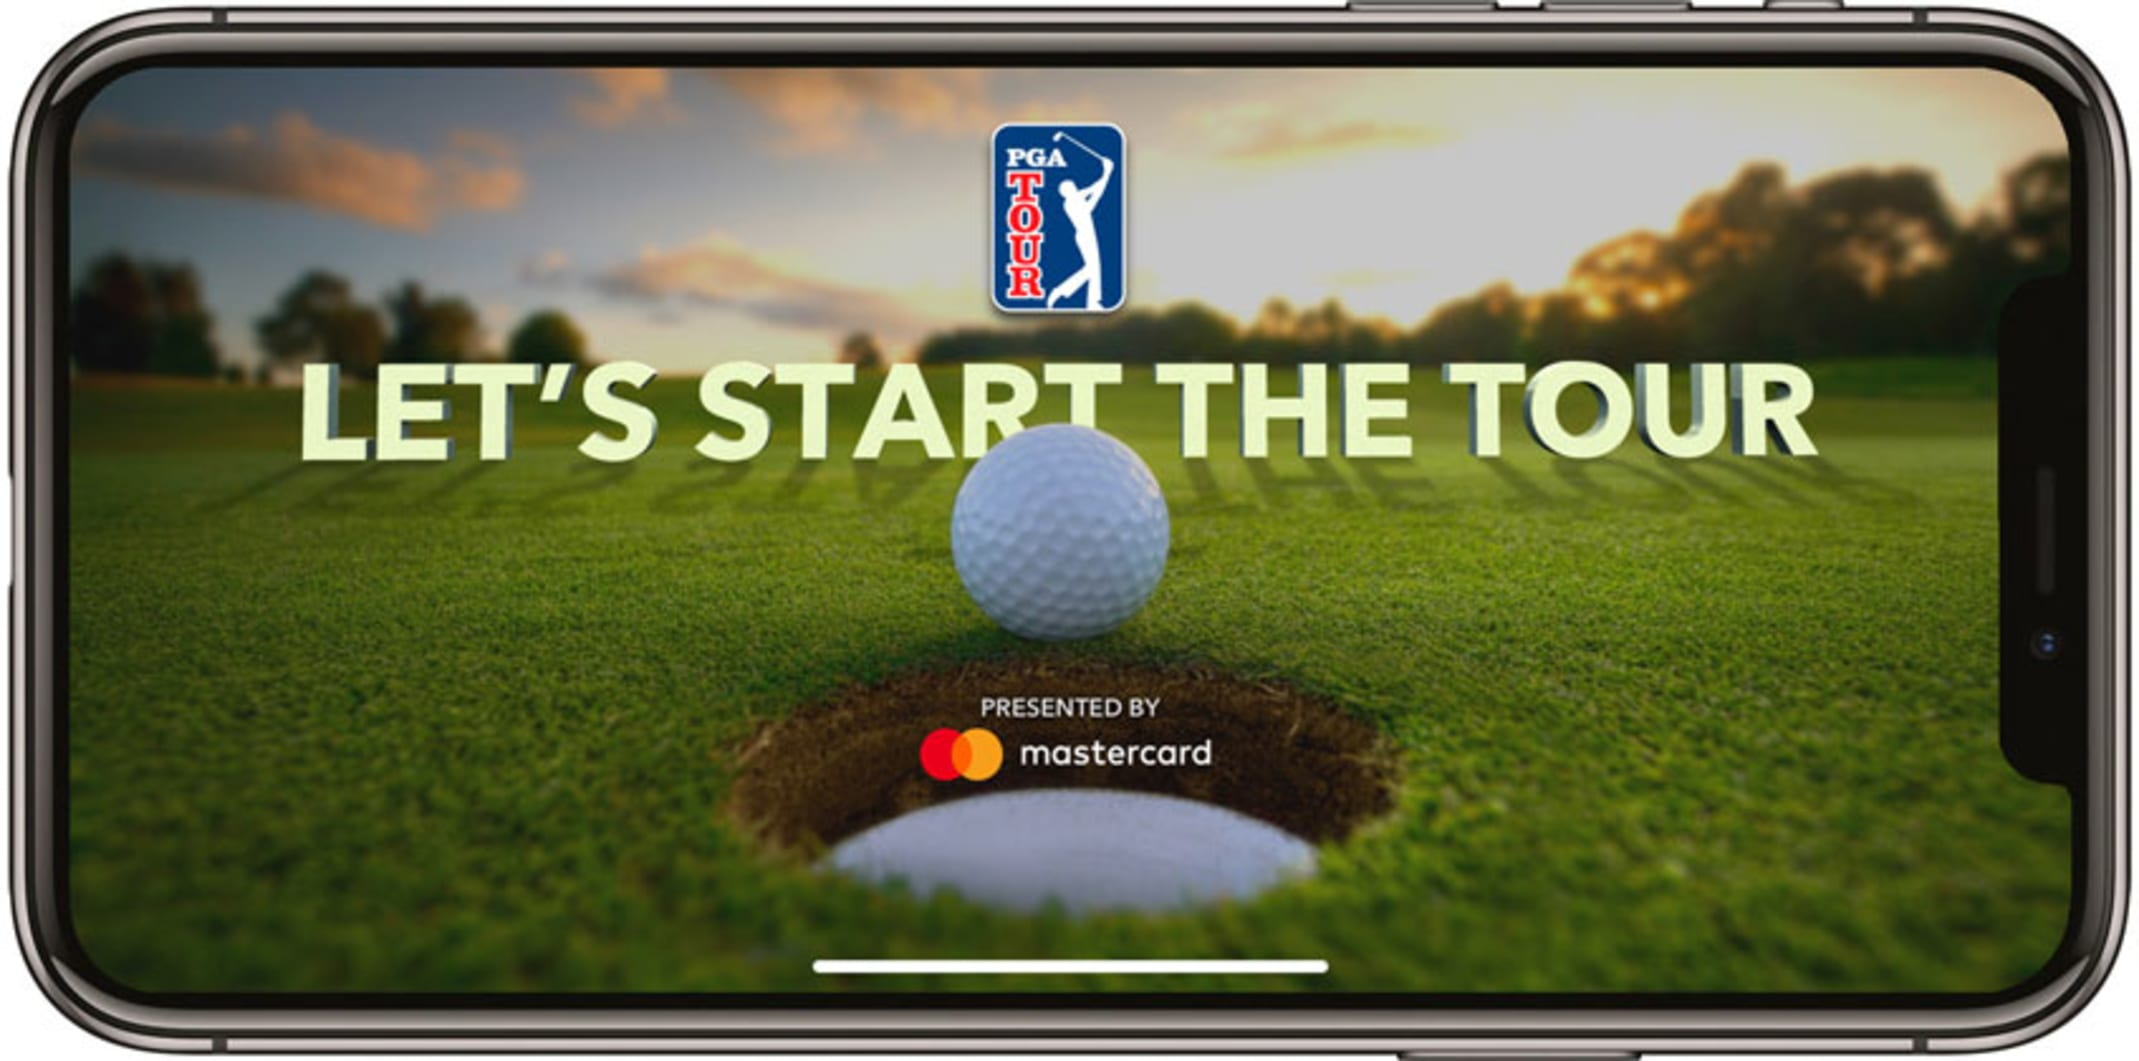 PGA TOUR announces innovative new Augmented Reality app